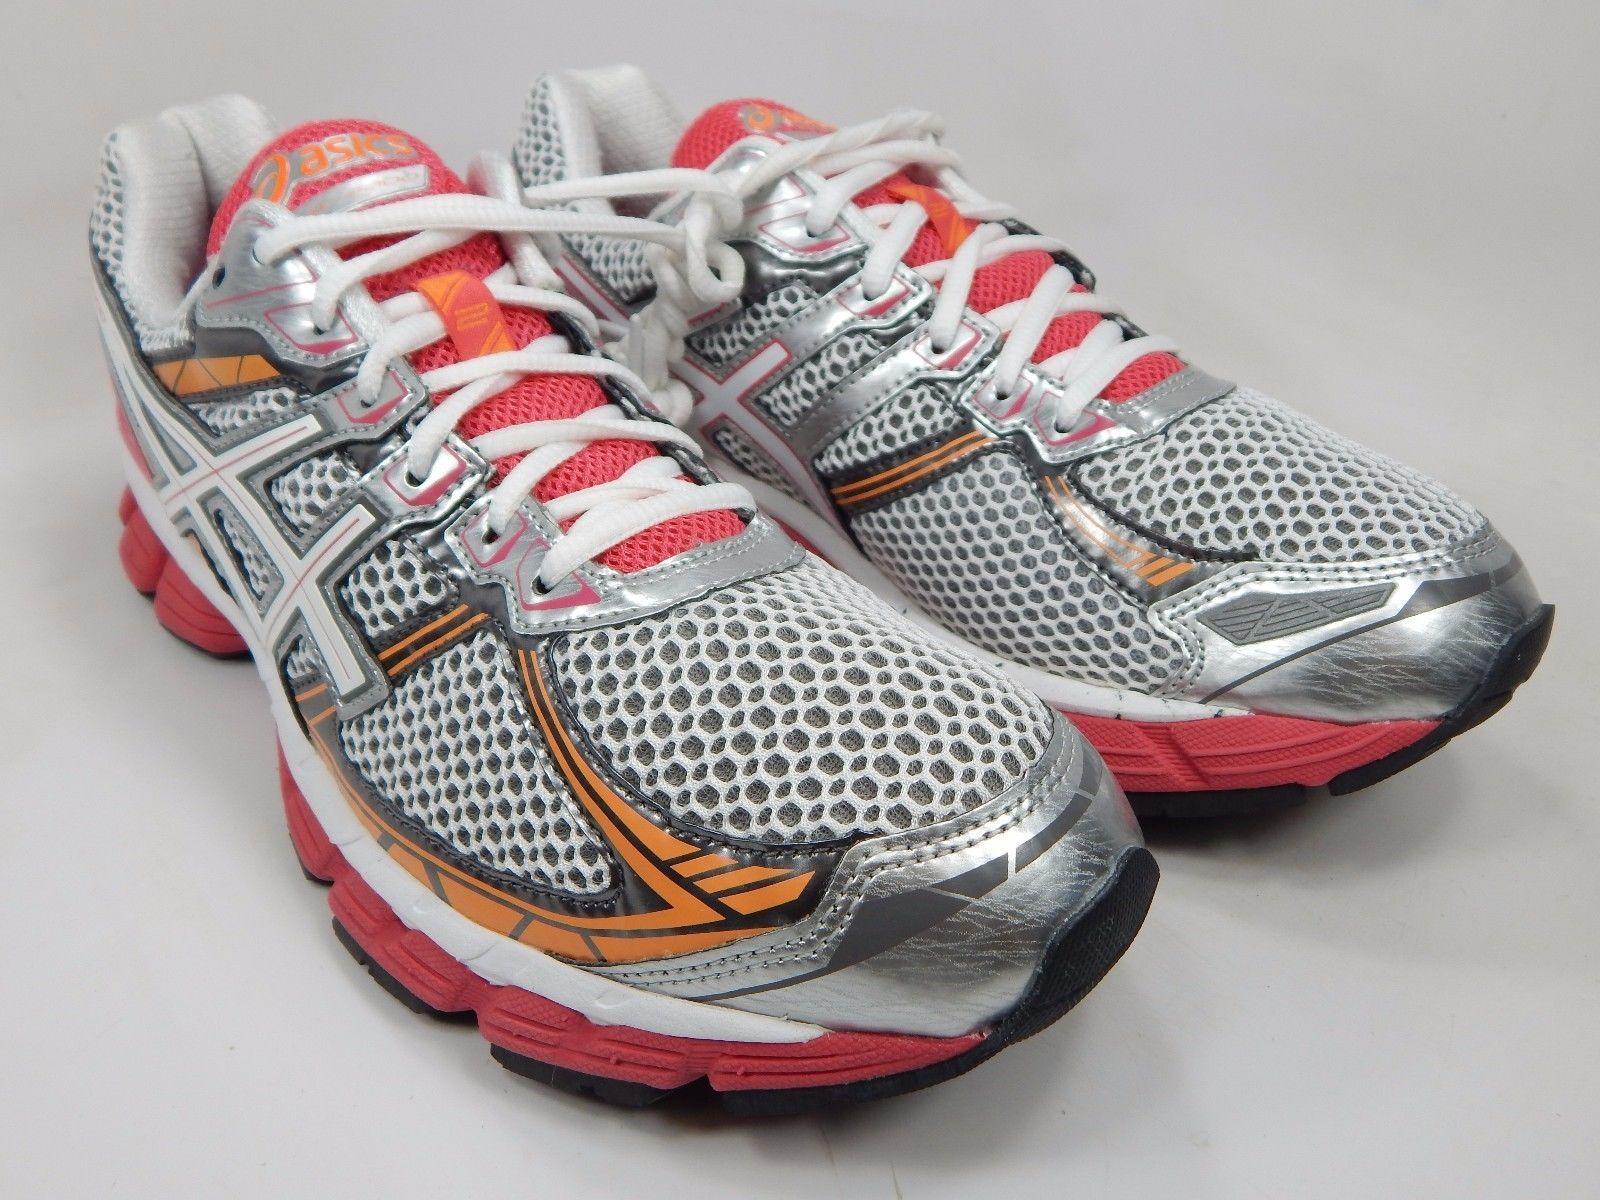 Asics GT 3000 v 2 Women's Running Shoes Size US 11 M (B) EU 43.5 Silver T450N